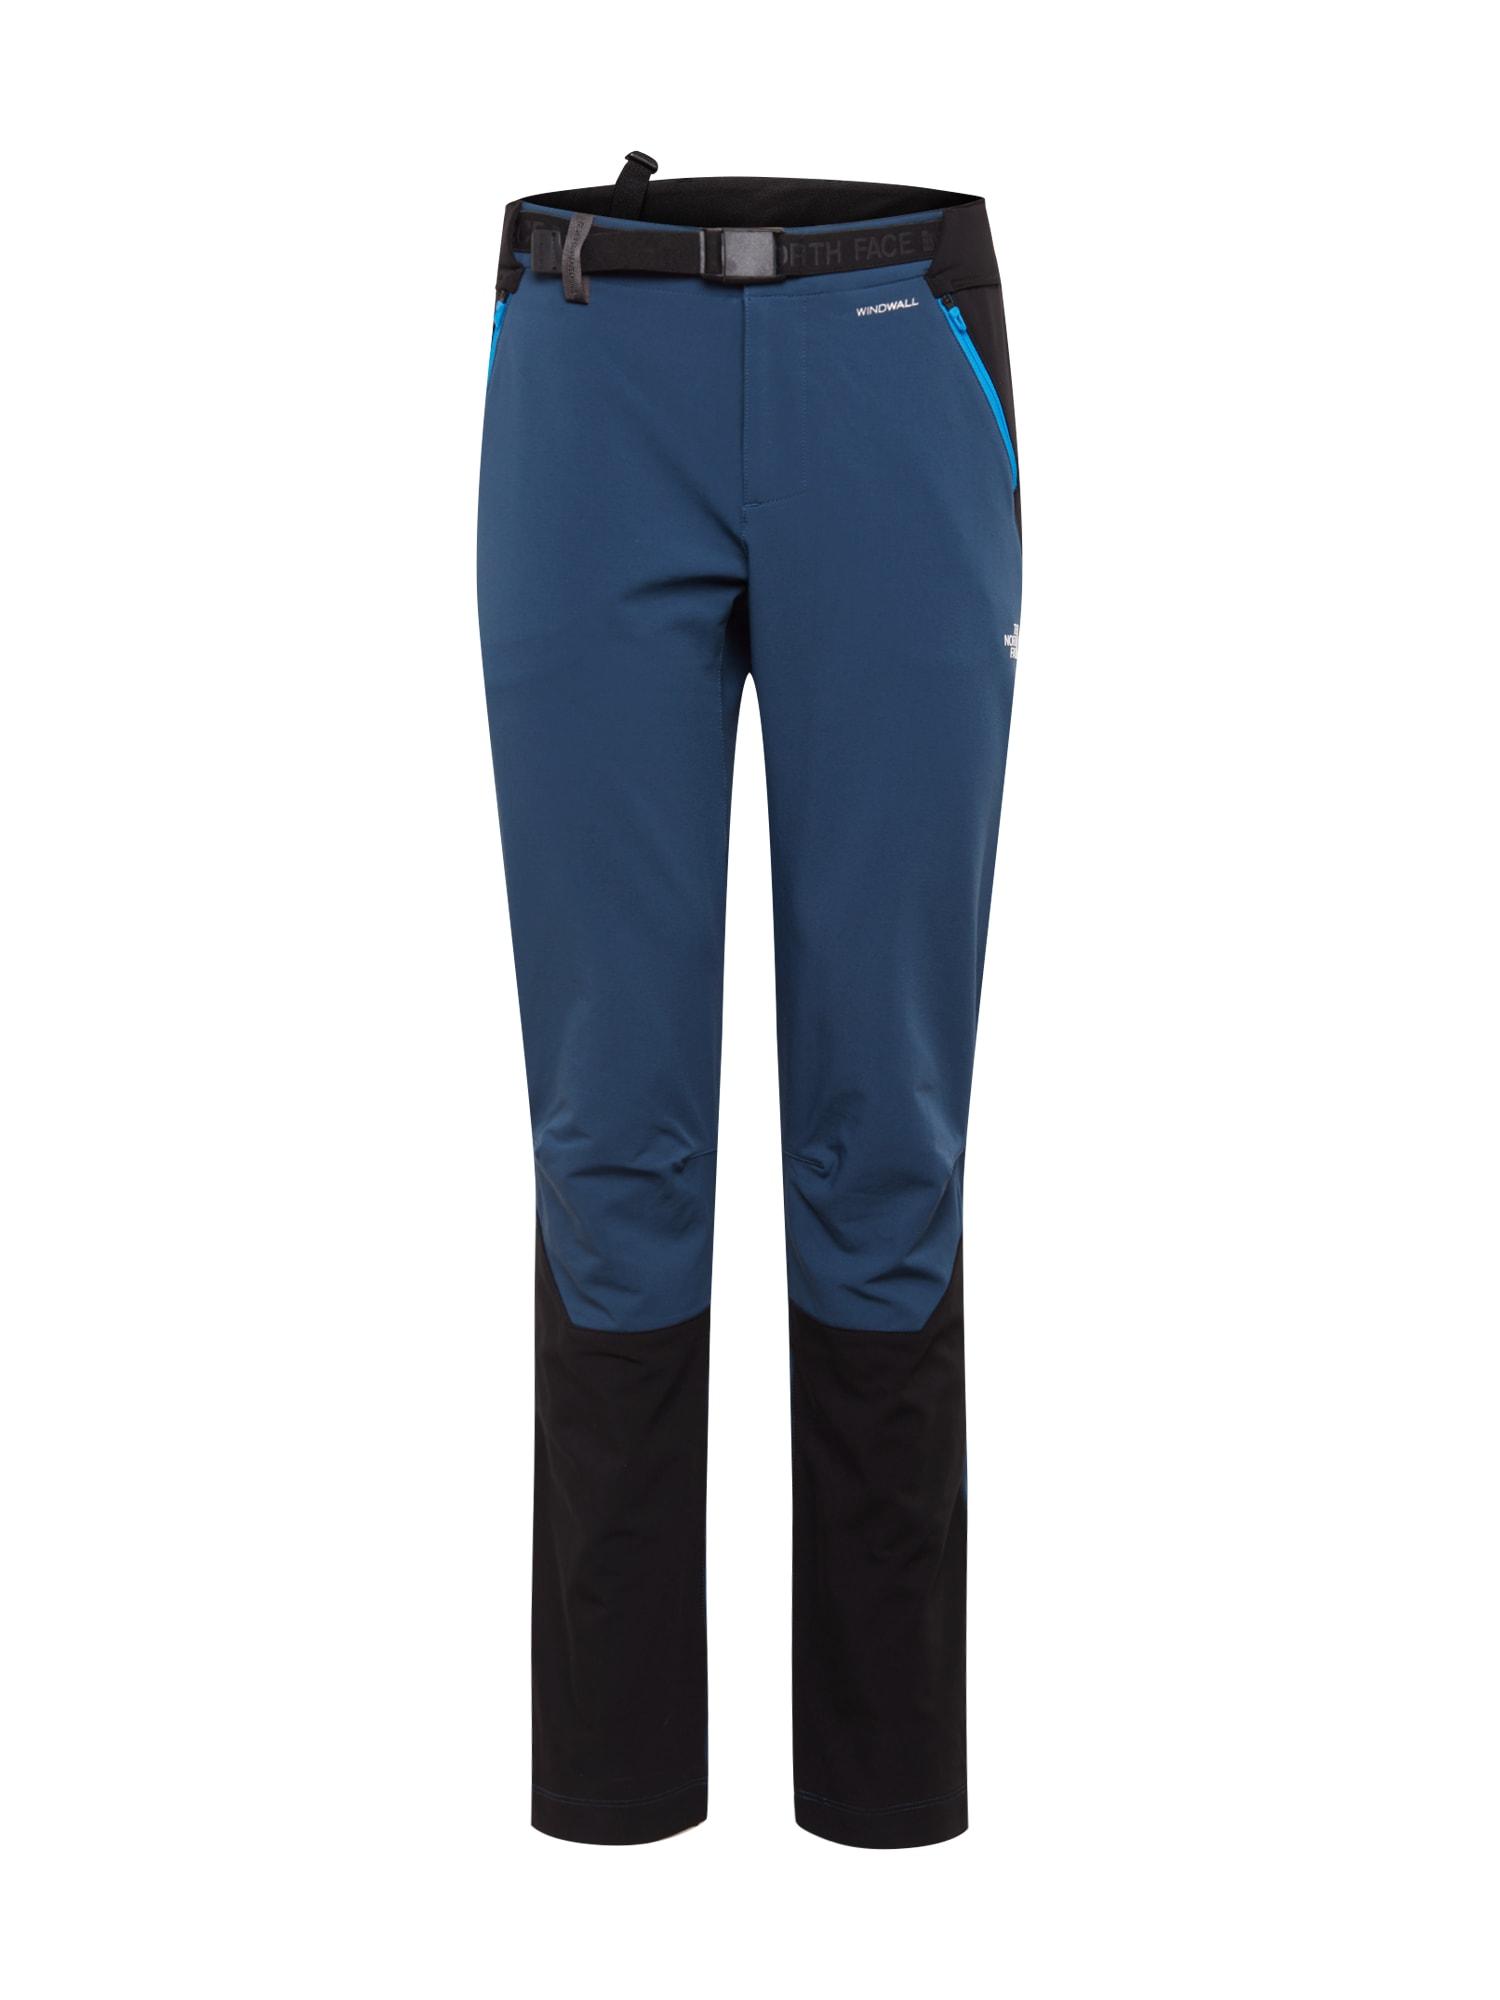 THE NORTH FACE Športové nohavice 'DIABLO'  čierna / modrá